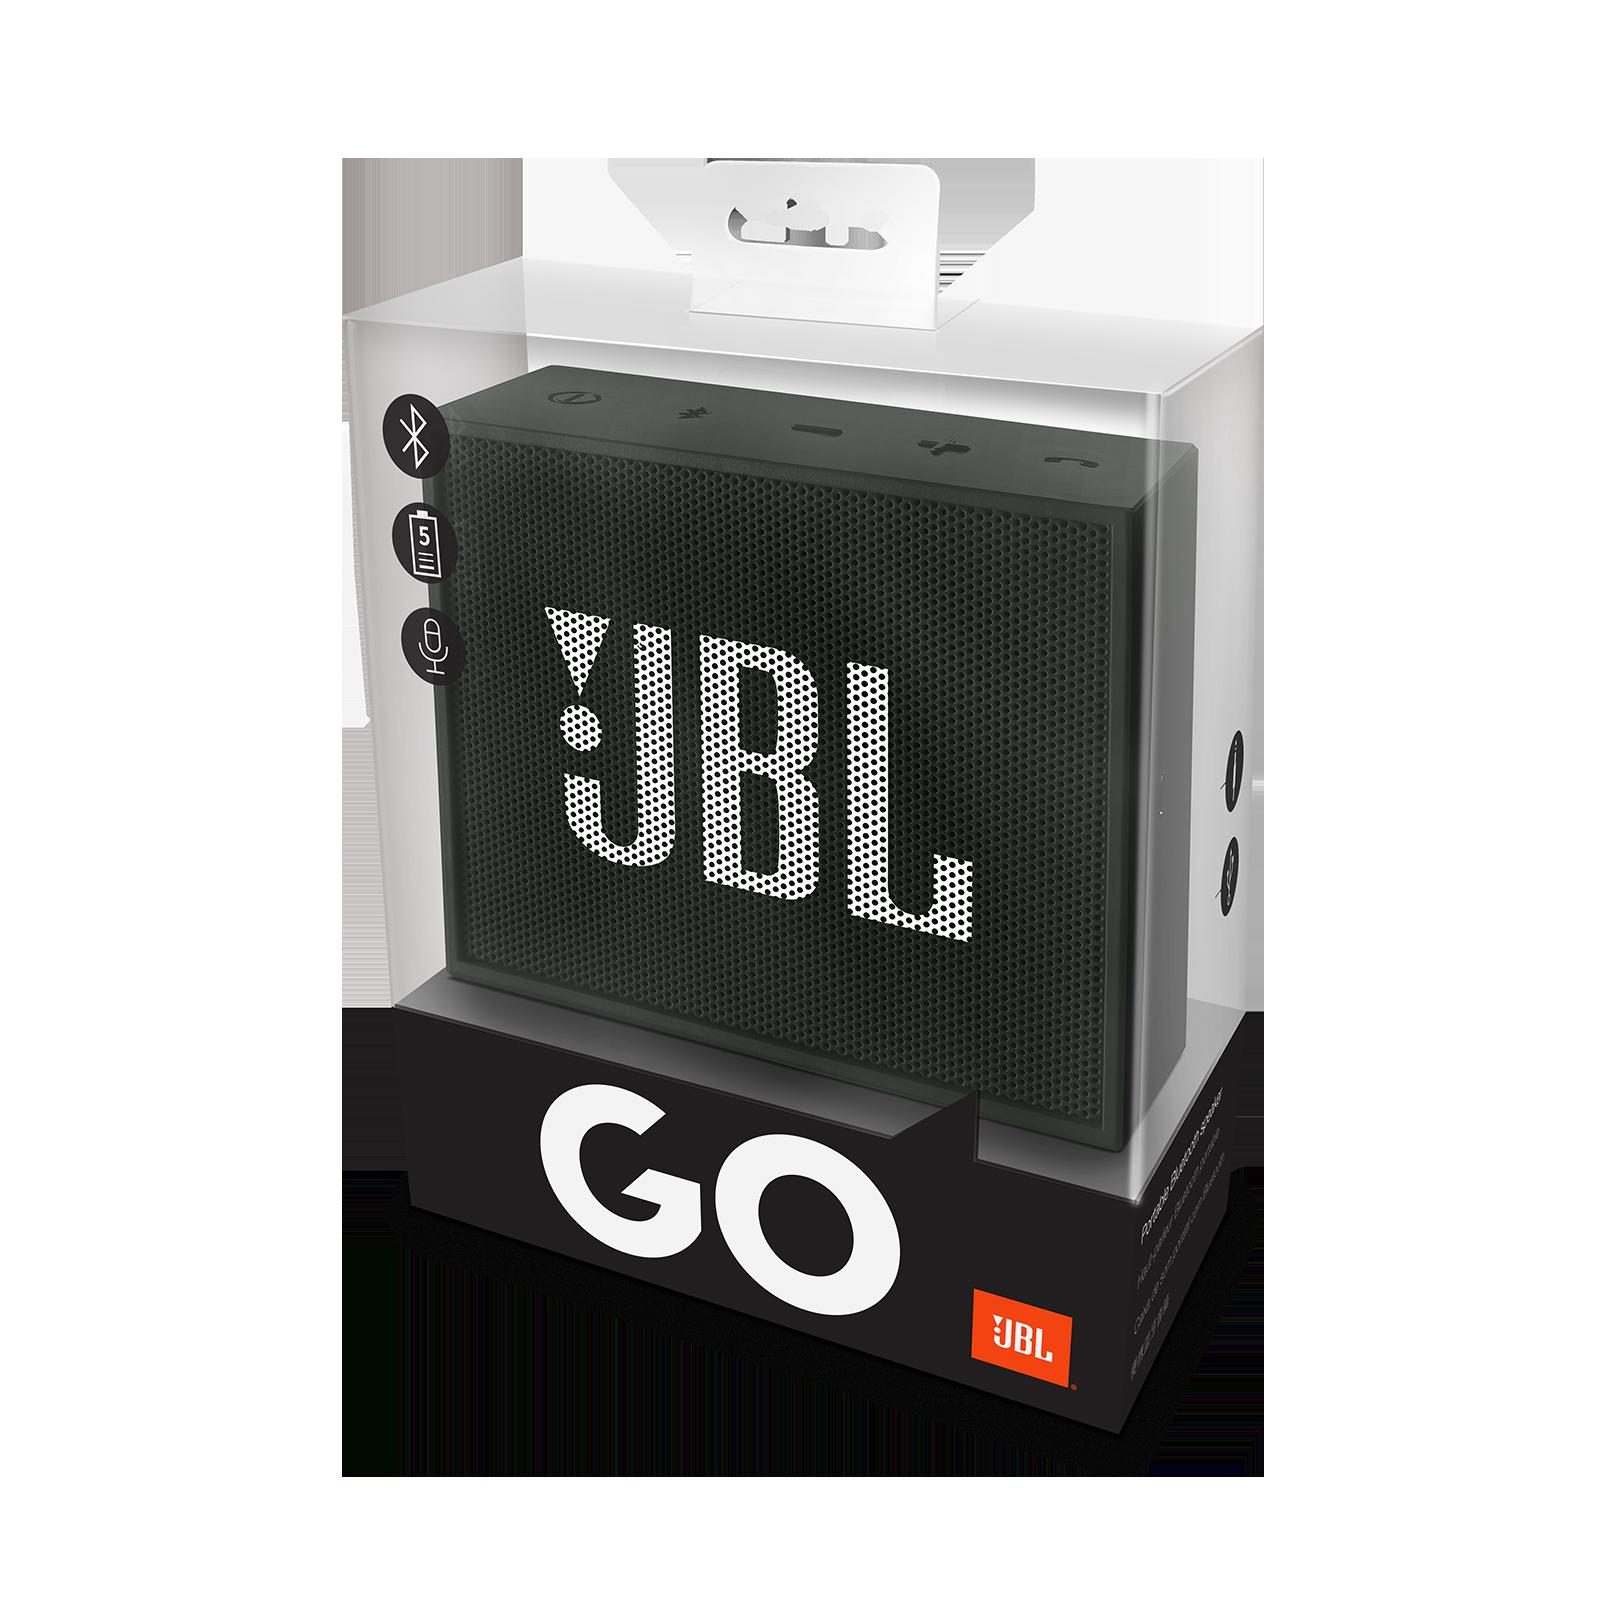 Jbl clip 2 portable bluetooth speakers download instruction manual pdf.